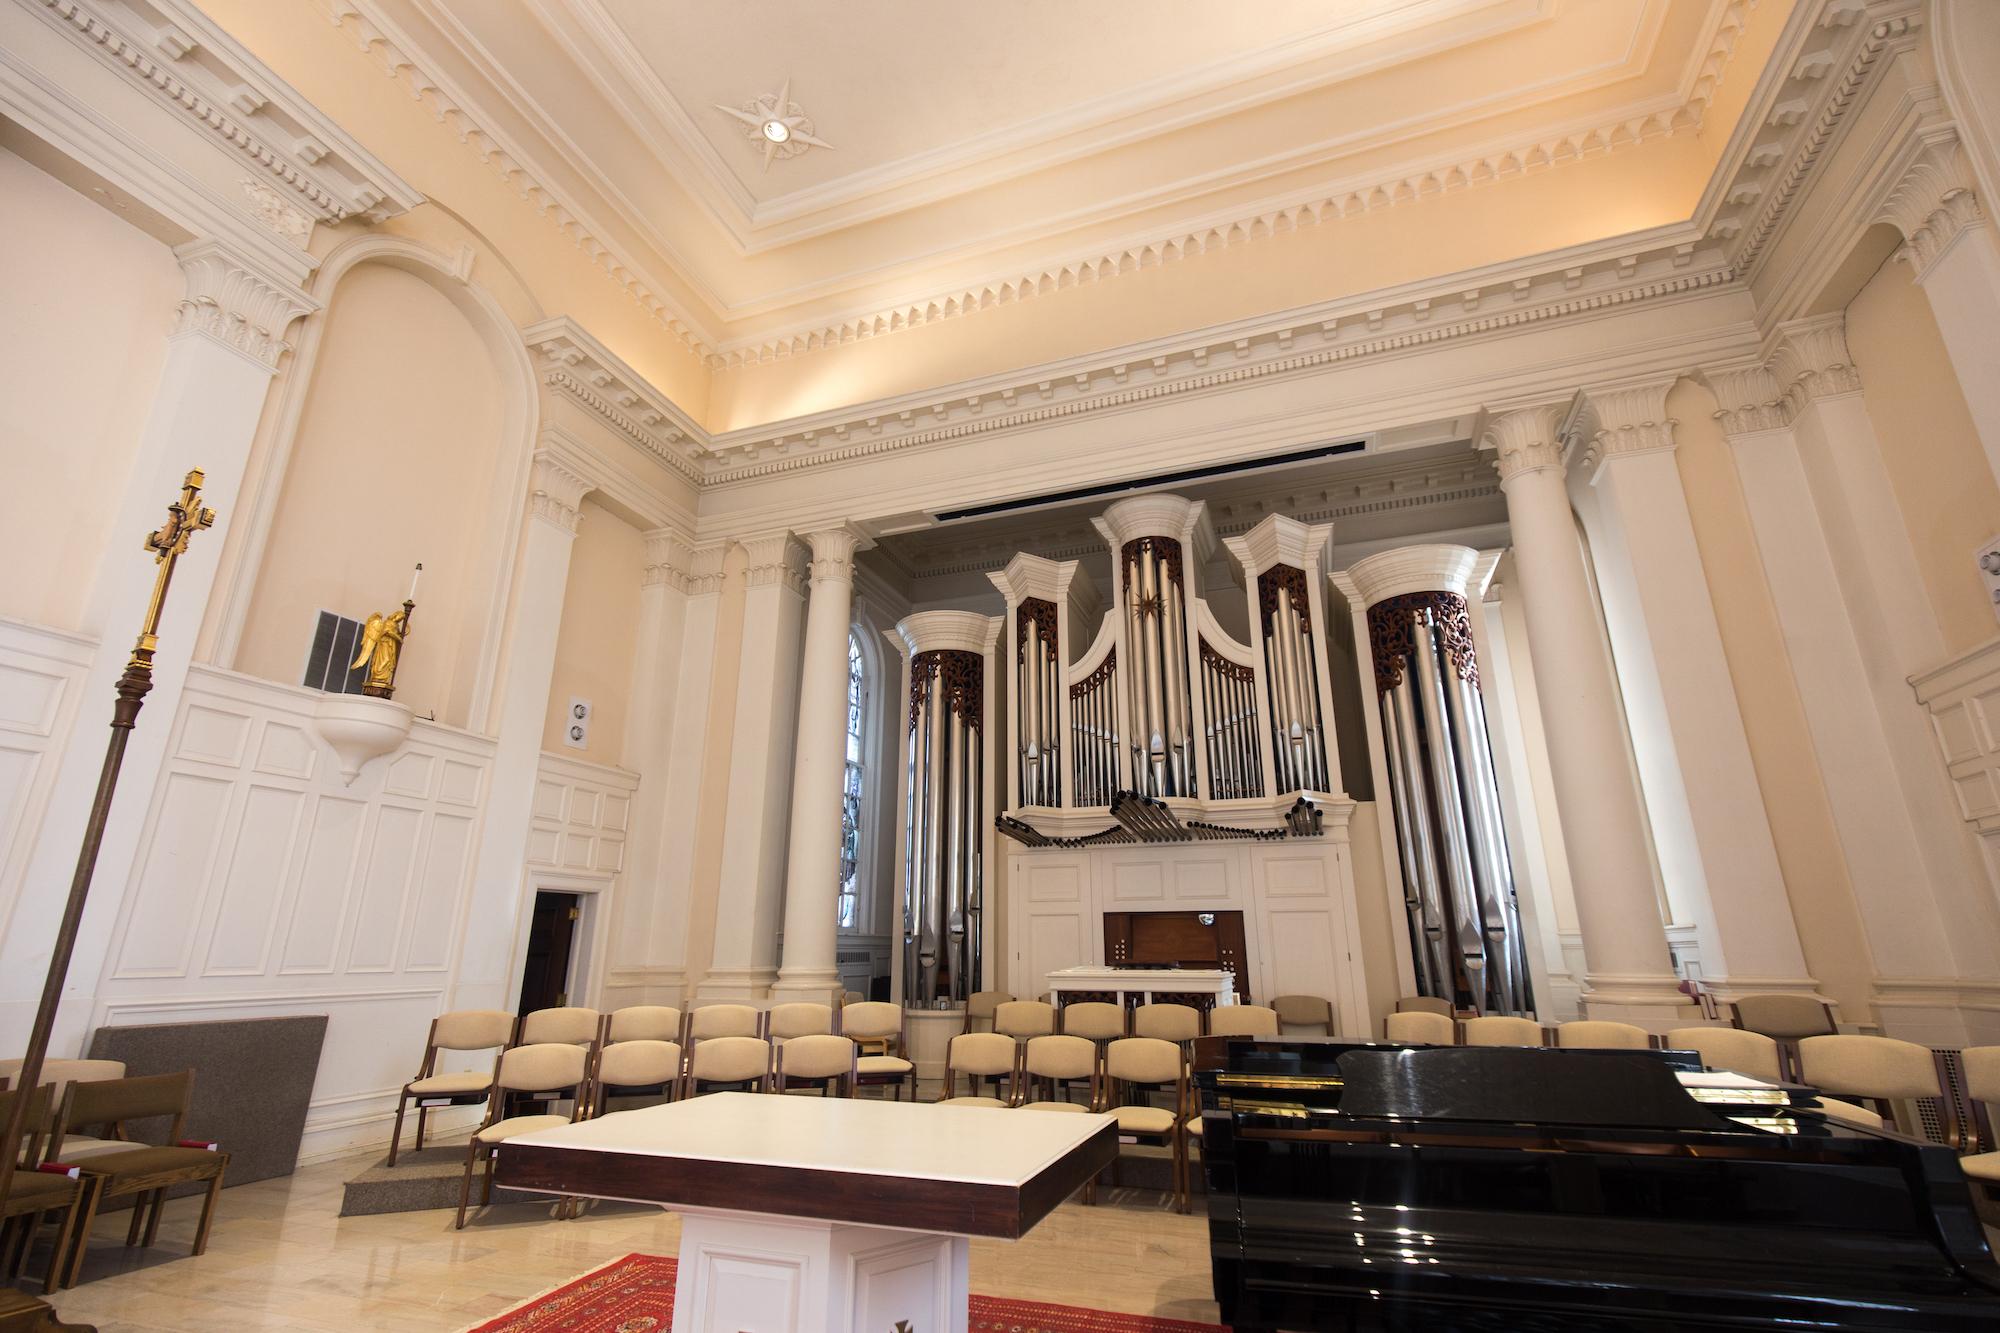 The Organ of the Church of the Abiding Presence